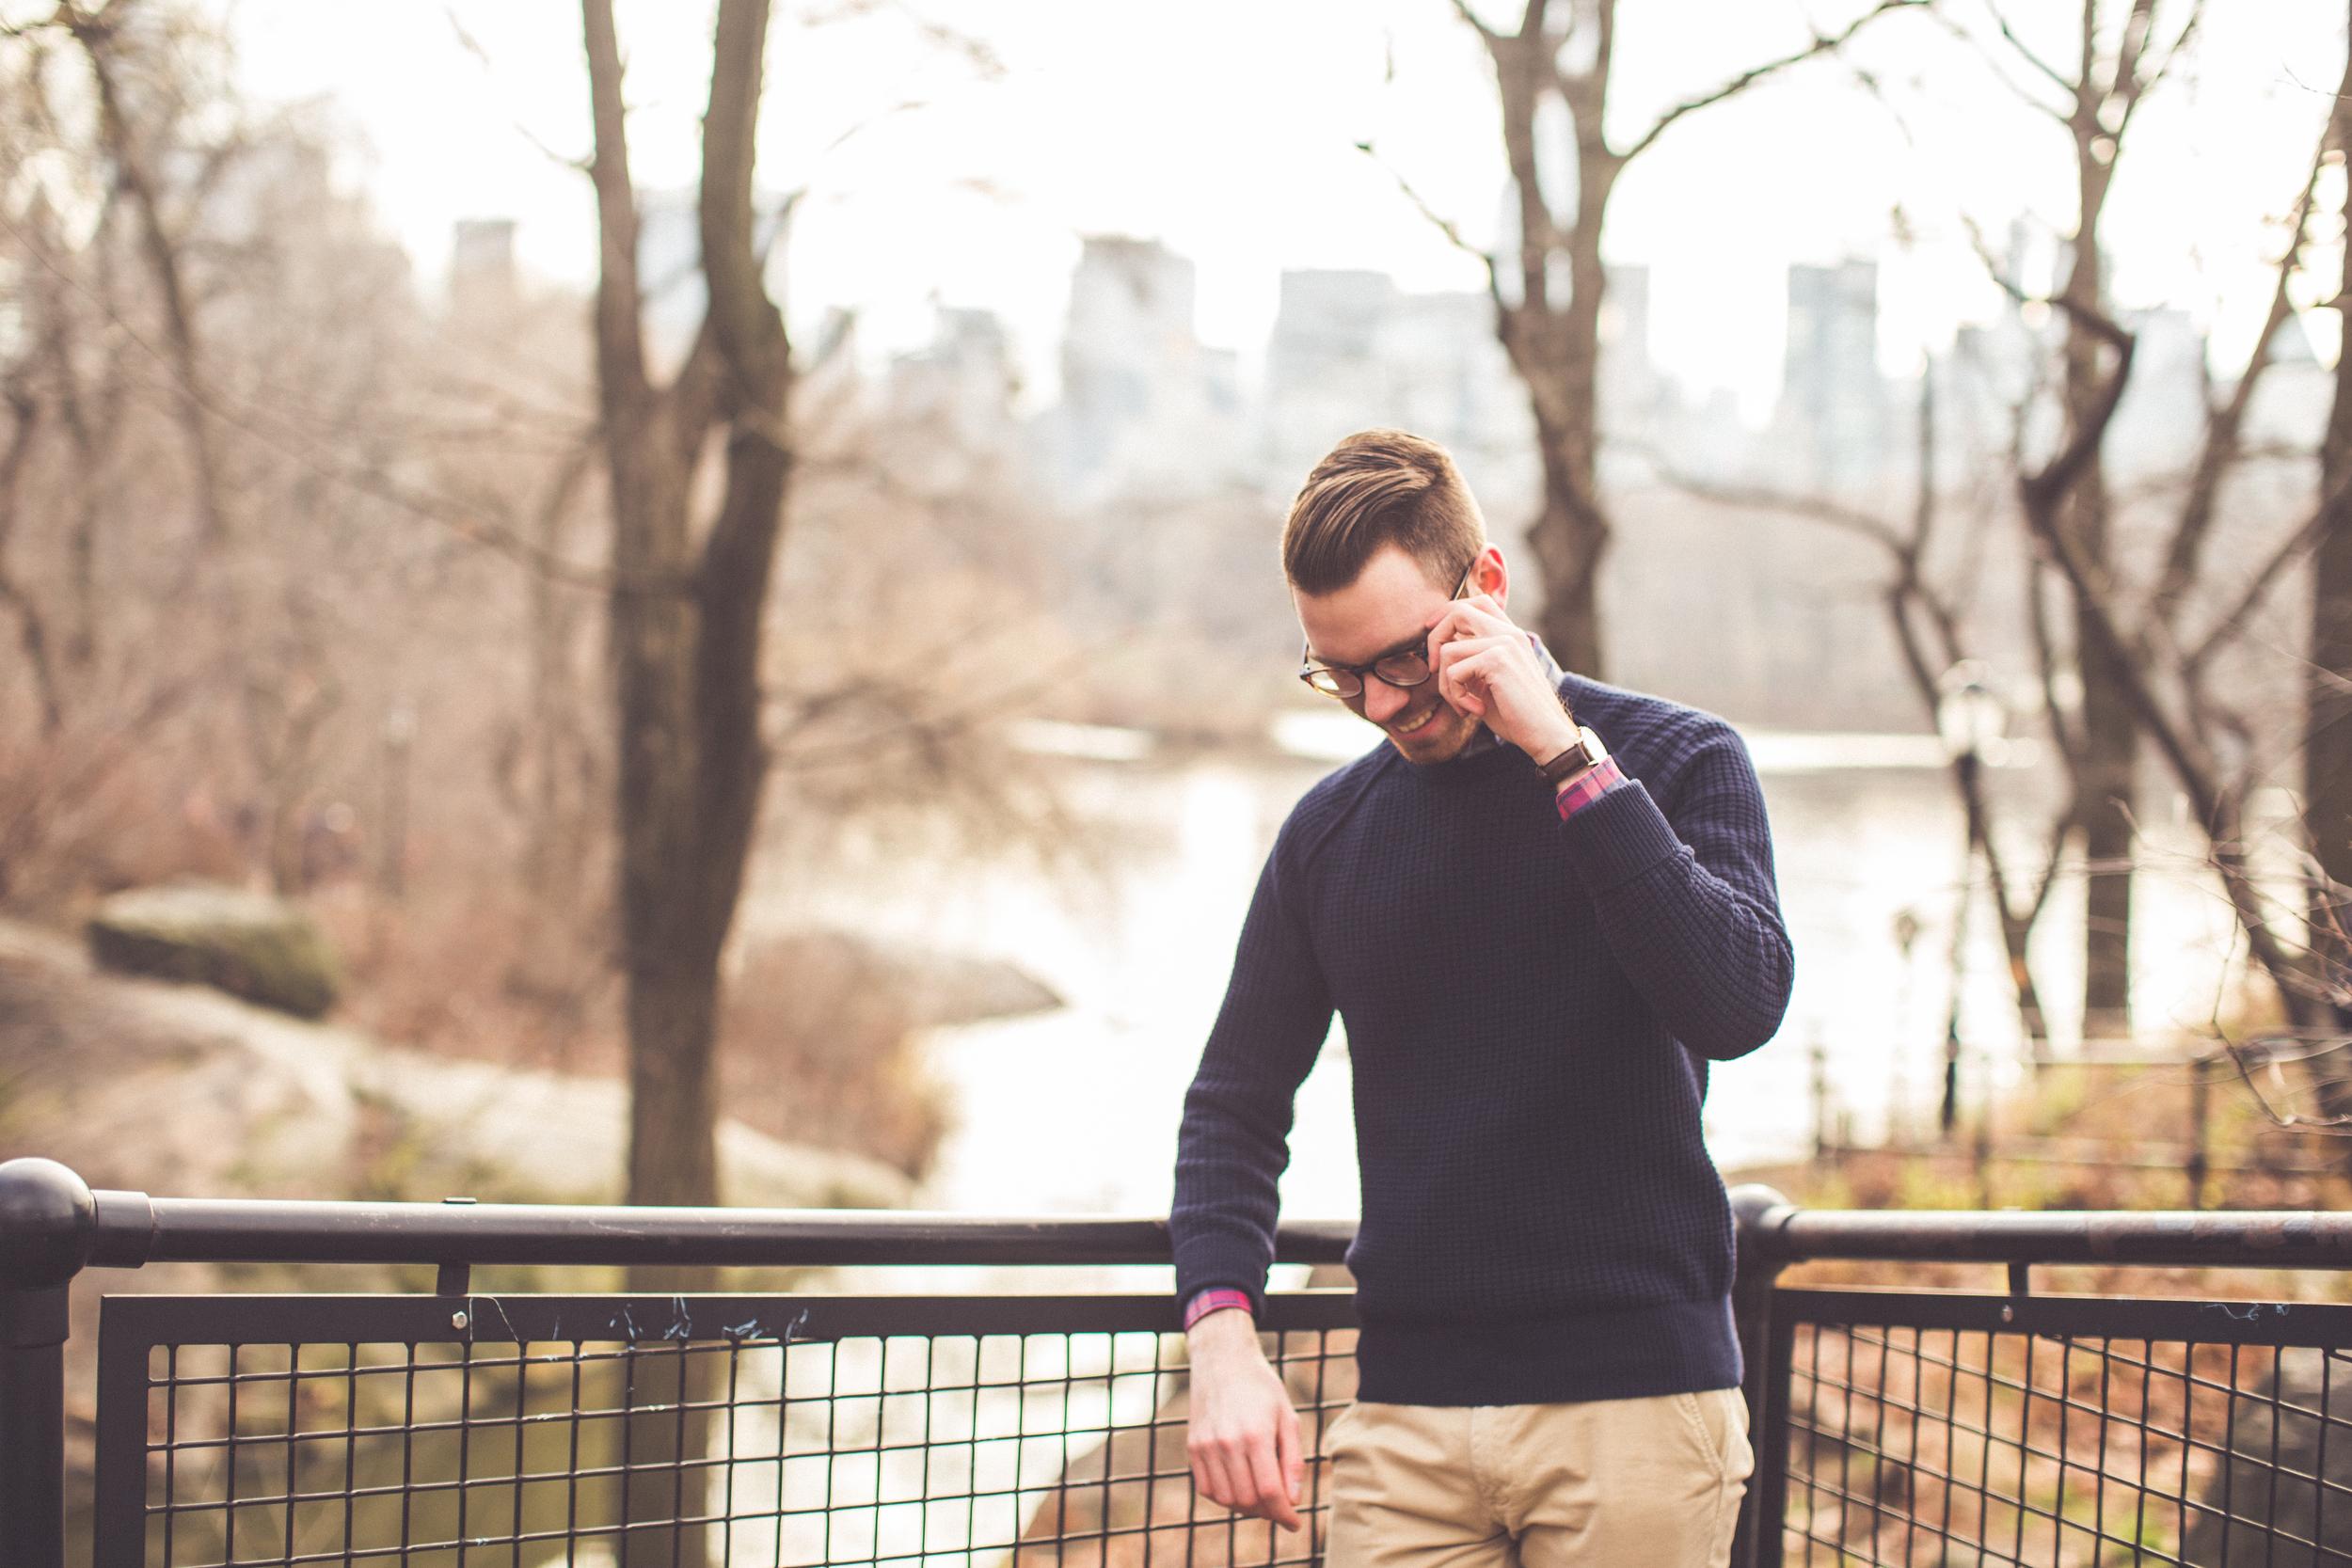 Pants: Brooks Brothers Red Fleece, Sweater: Banana Republic, Shirt: Ledbury, Watch: Daniel Wellington, Glasses: Ralph Lauren, Photo: Taylor Camp